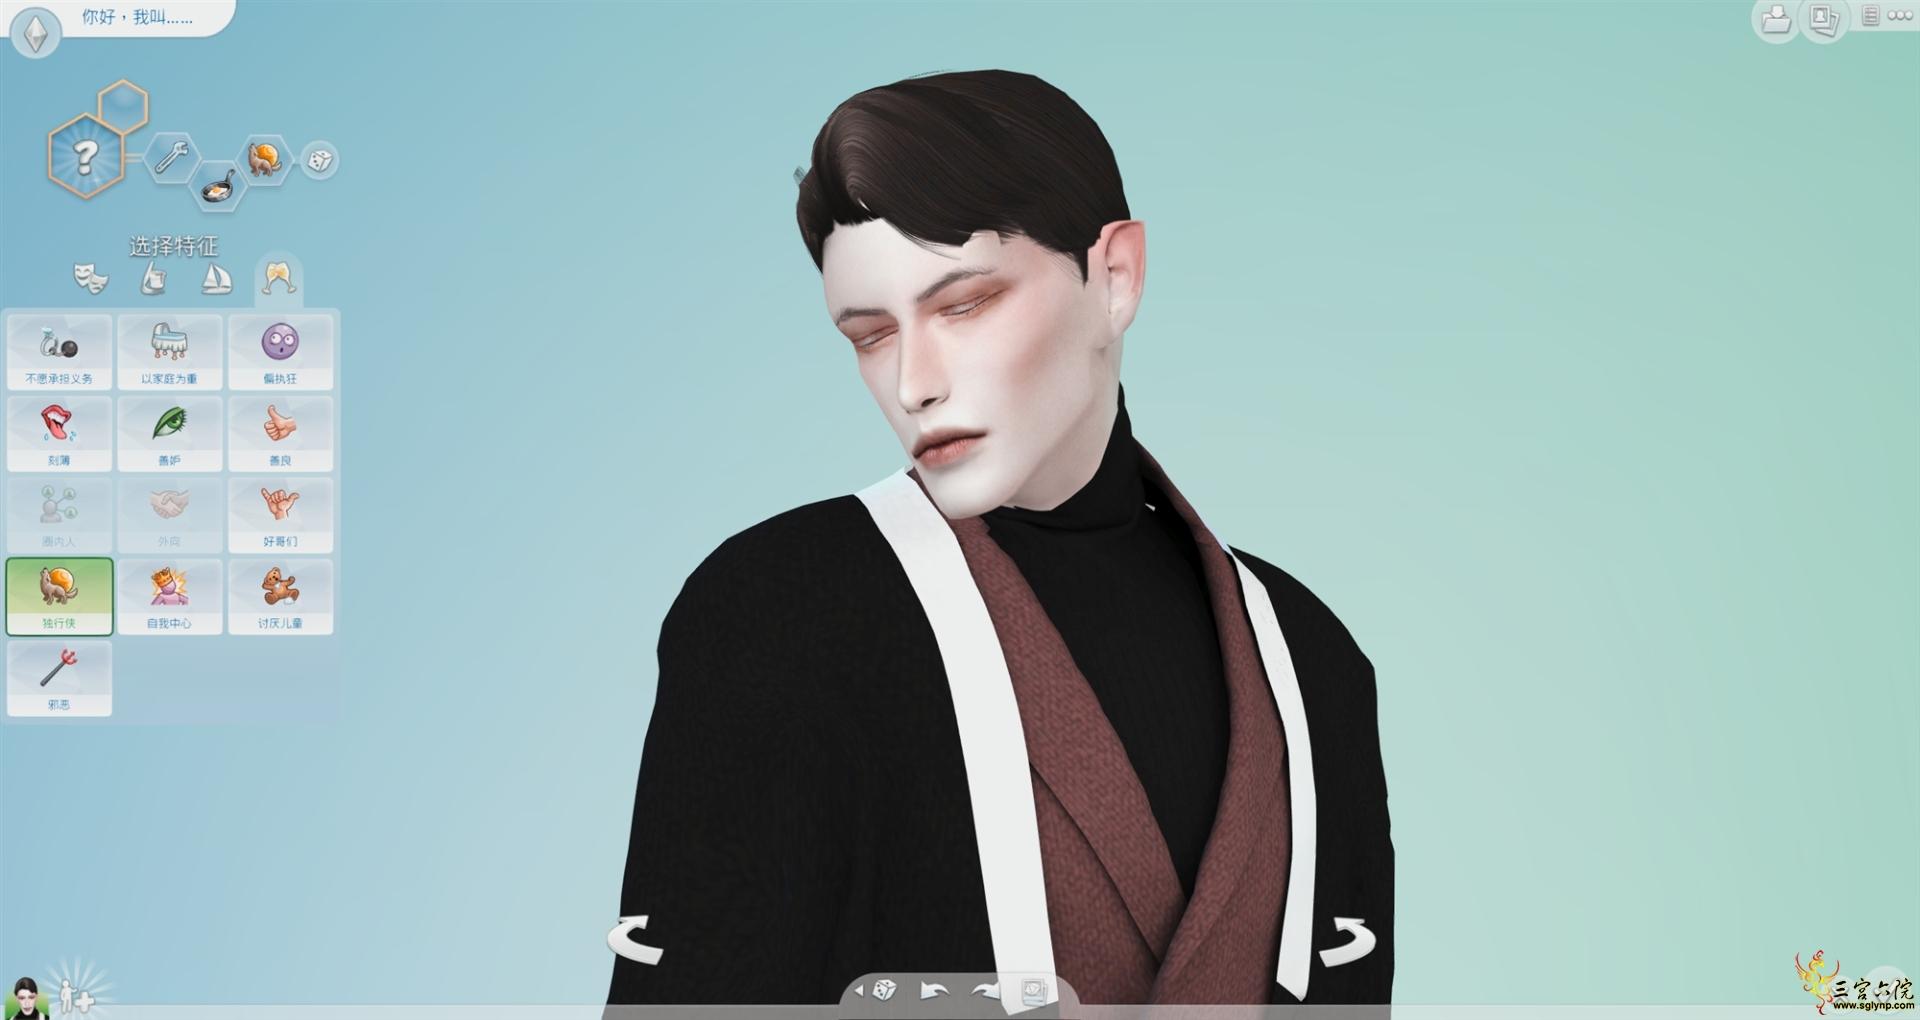 Sims 4 Screenshot 2020.10.07 - 15.01.35.14_副本.jpg